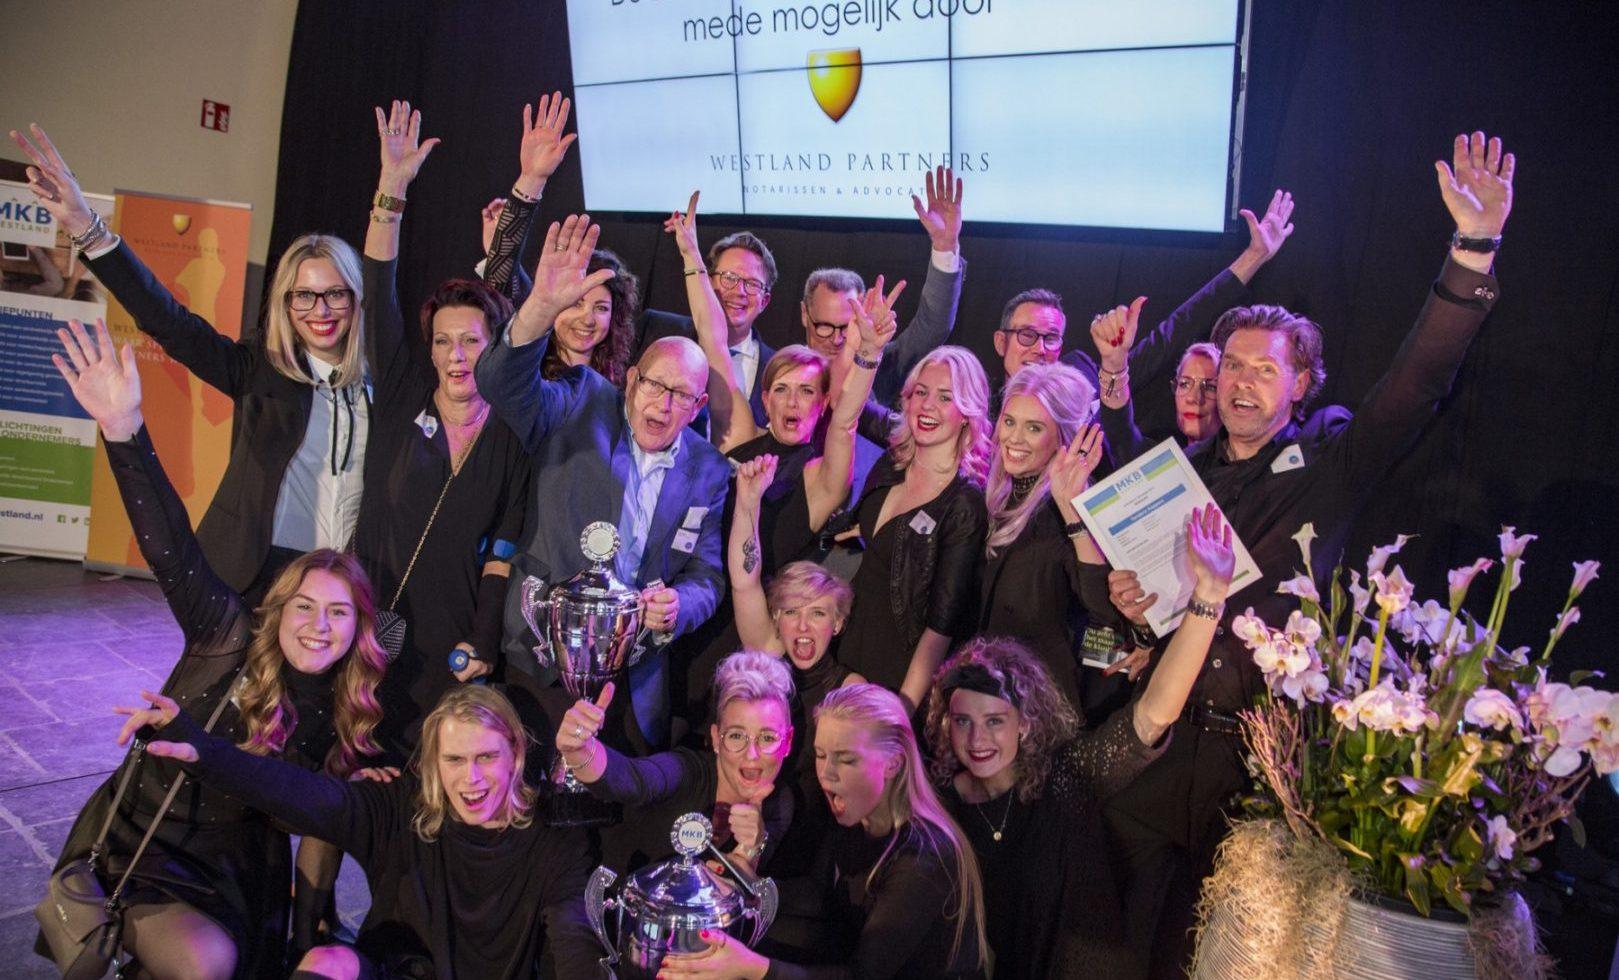 Tendenz Kappers wint MKB Westland Partners Ondernemersprijs 2017